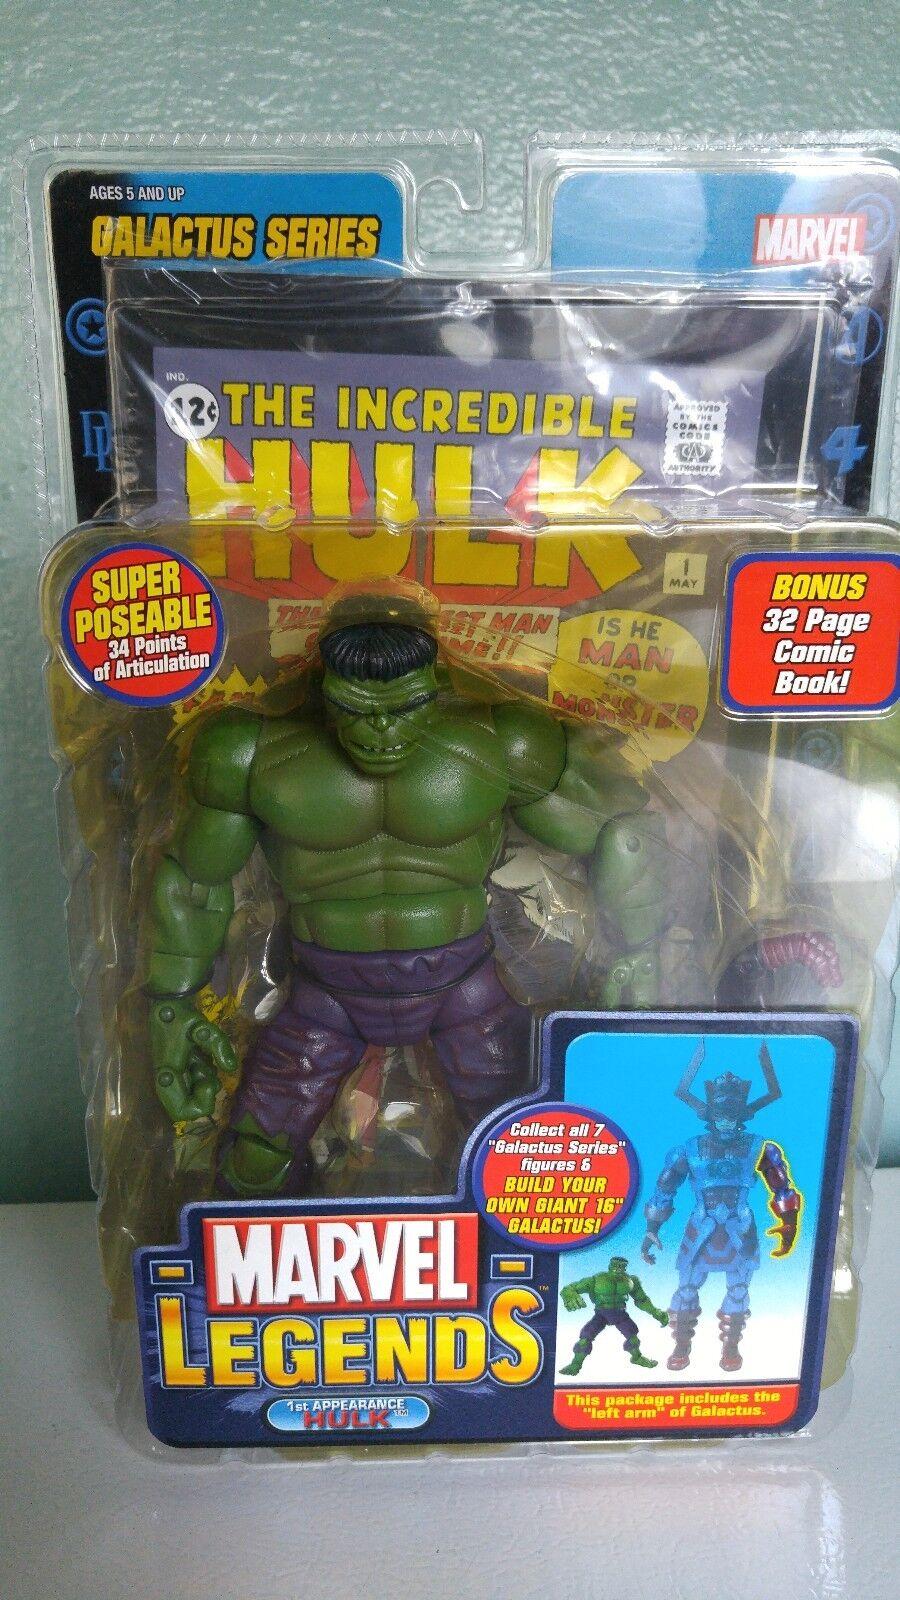 Hulk 1st Appearance Galactus Series  Marvel Legends 2005  negozio d'offerta